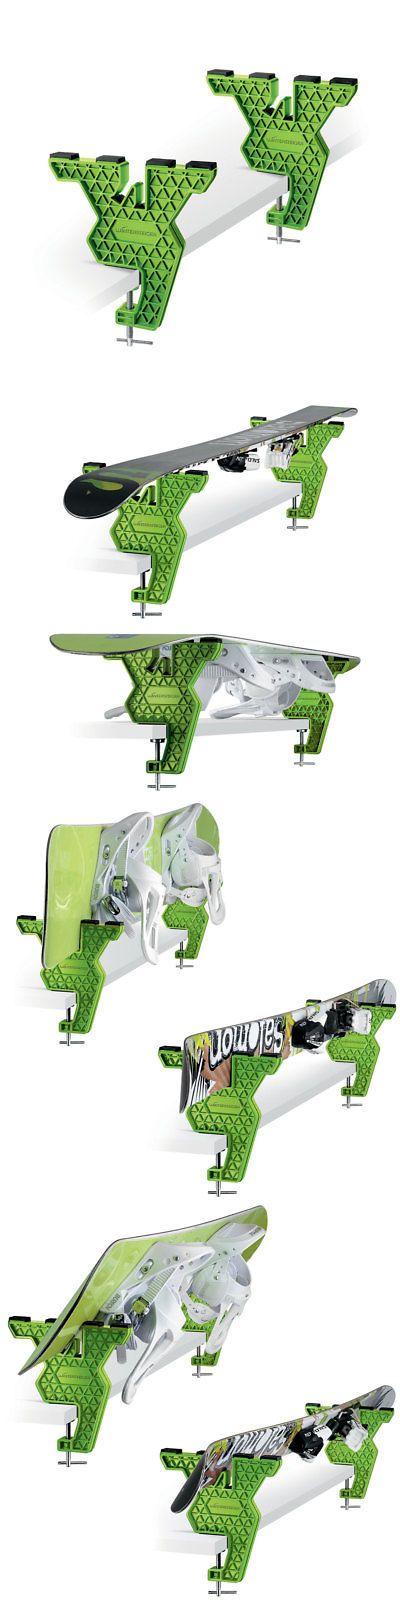 Tuning Tools 119237: Wintersteiger Freeride Ski Snowboard Tuning Vise -> BUY IT NOW ONLY: $78.97 on eBay!